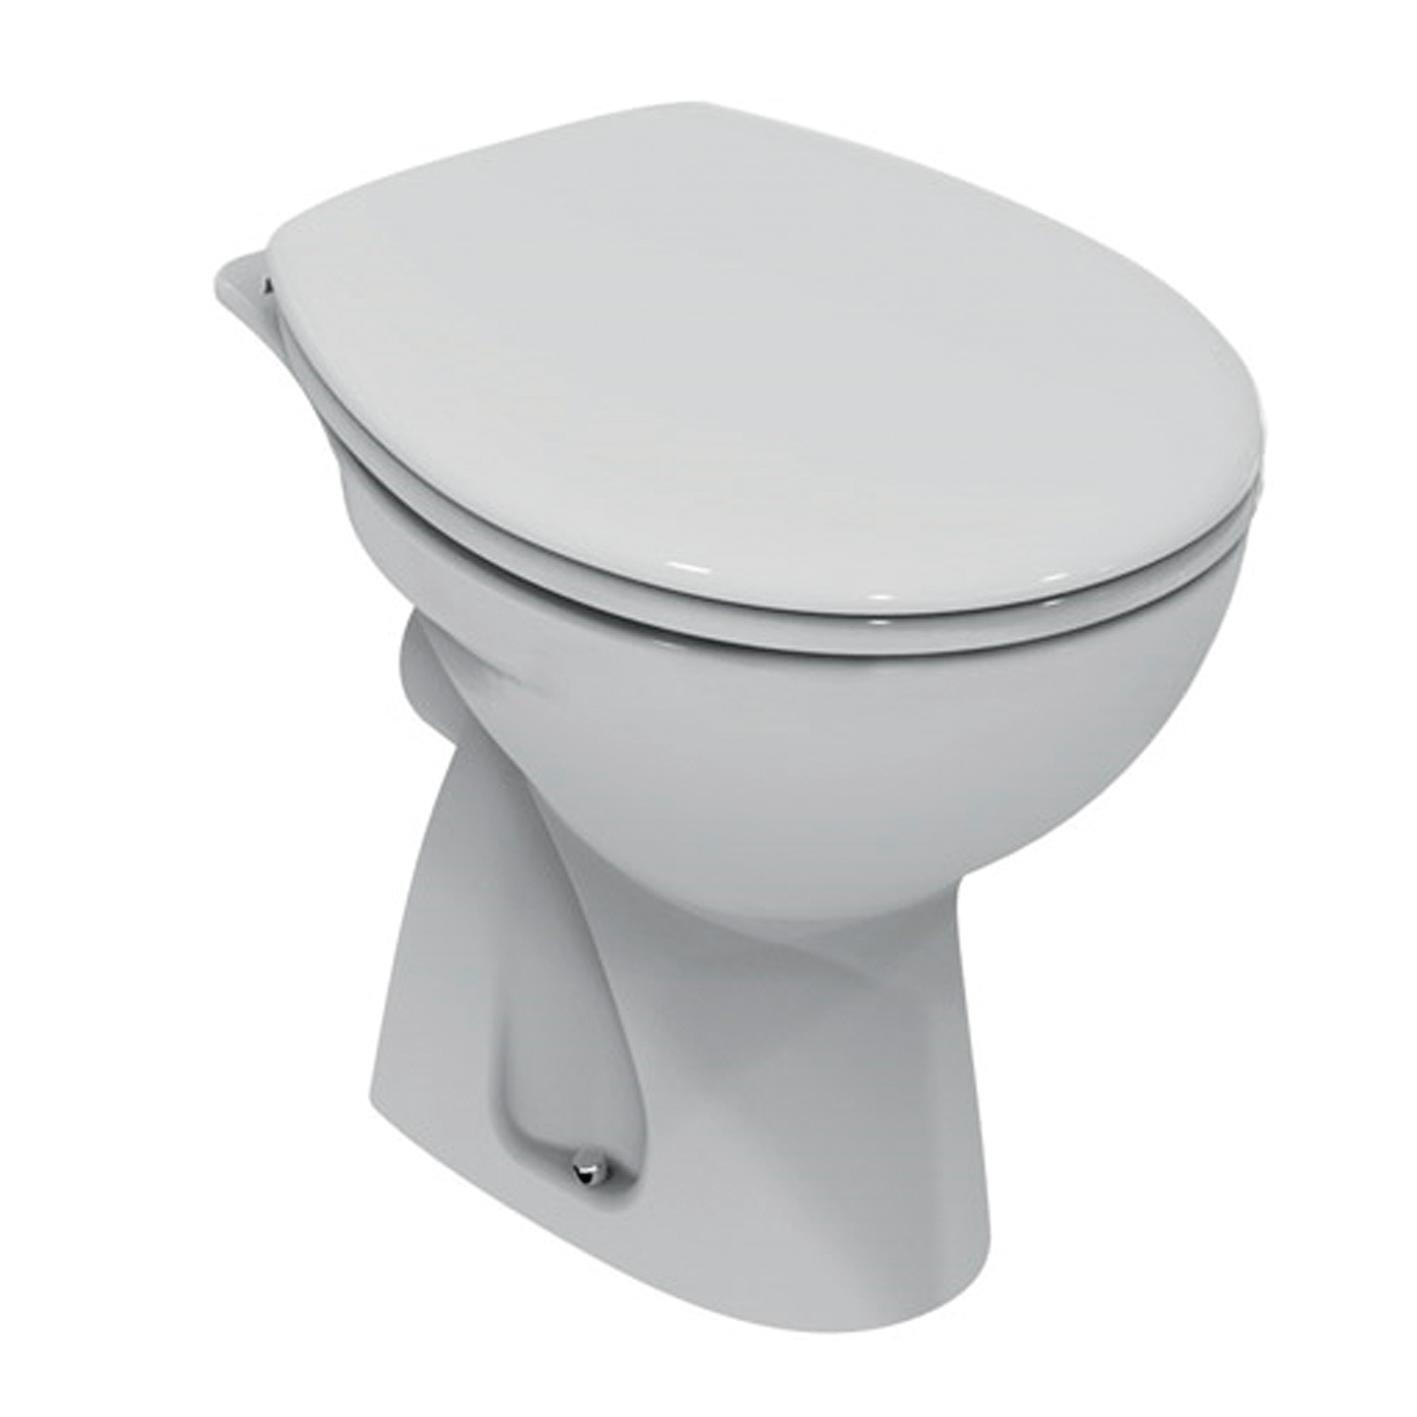 Coppia sanitari pavimento distanziato Miky New IDEAL STANDARD - 4